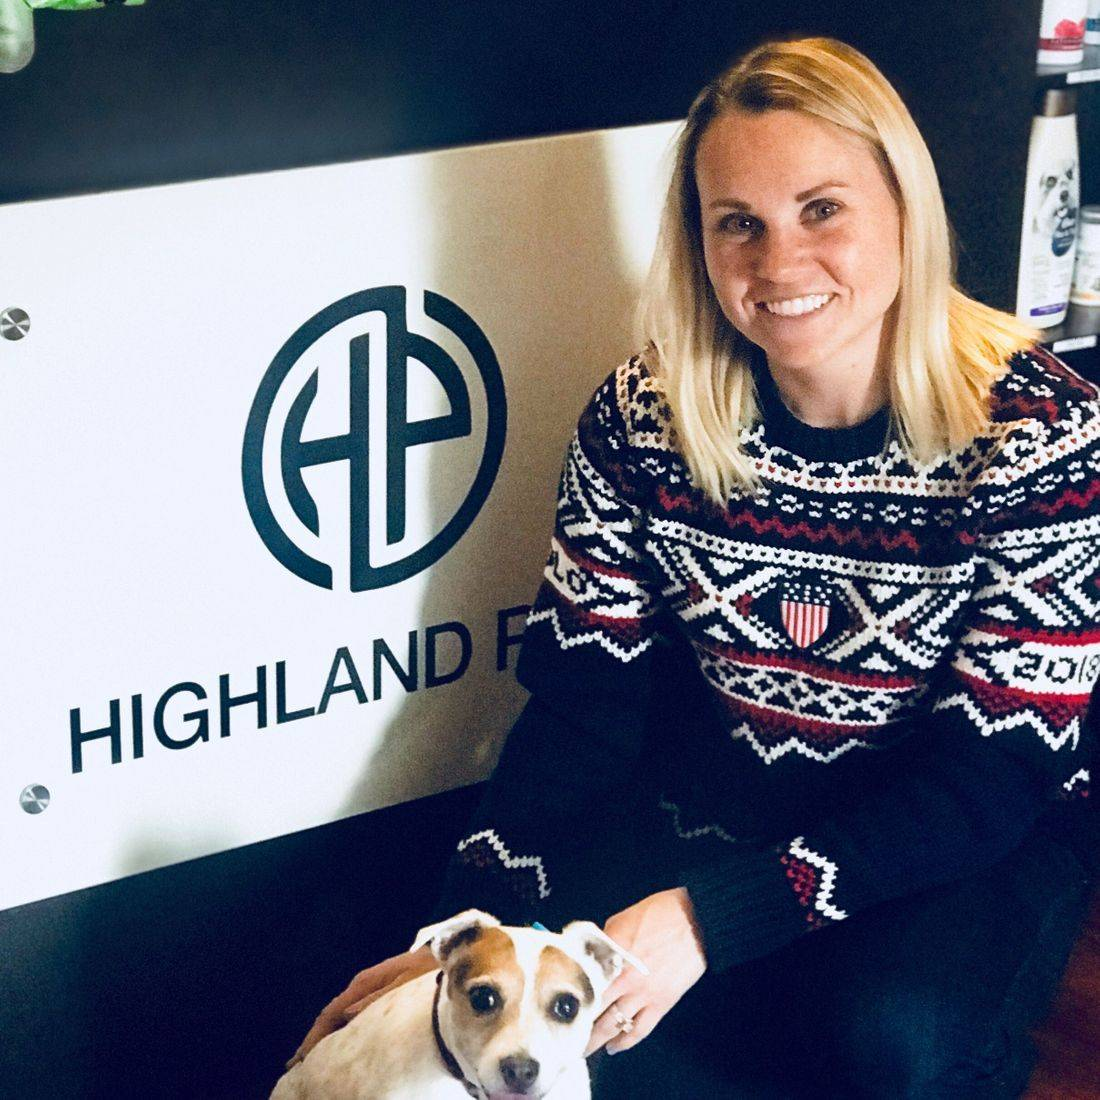 Dog Hurley Jessica Kooreman Dog Olympics USA Team